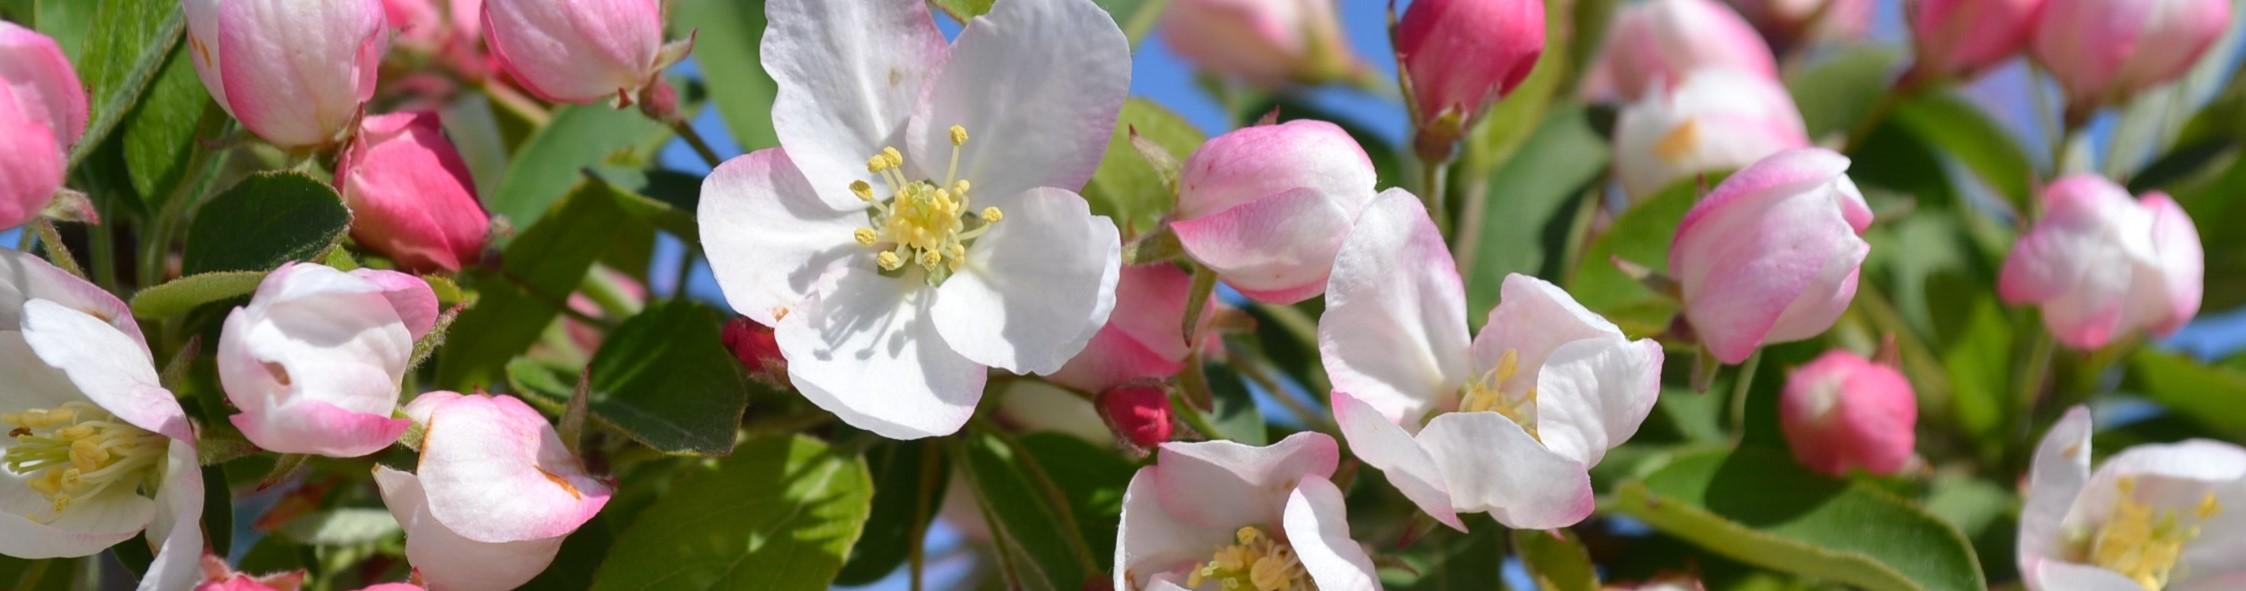 Crabapple-Flowers-2